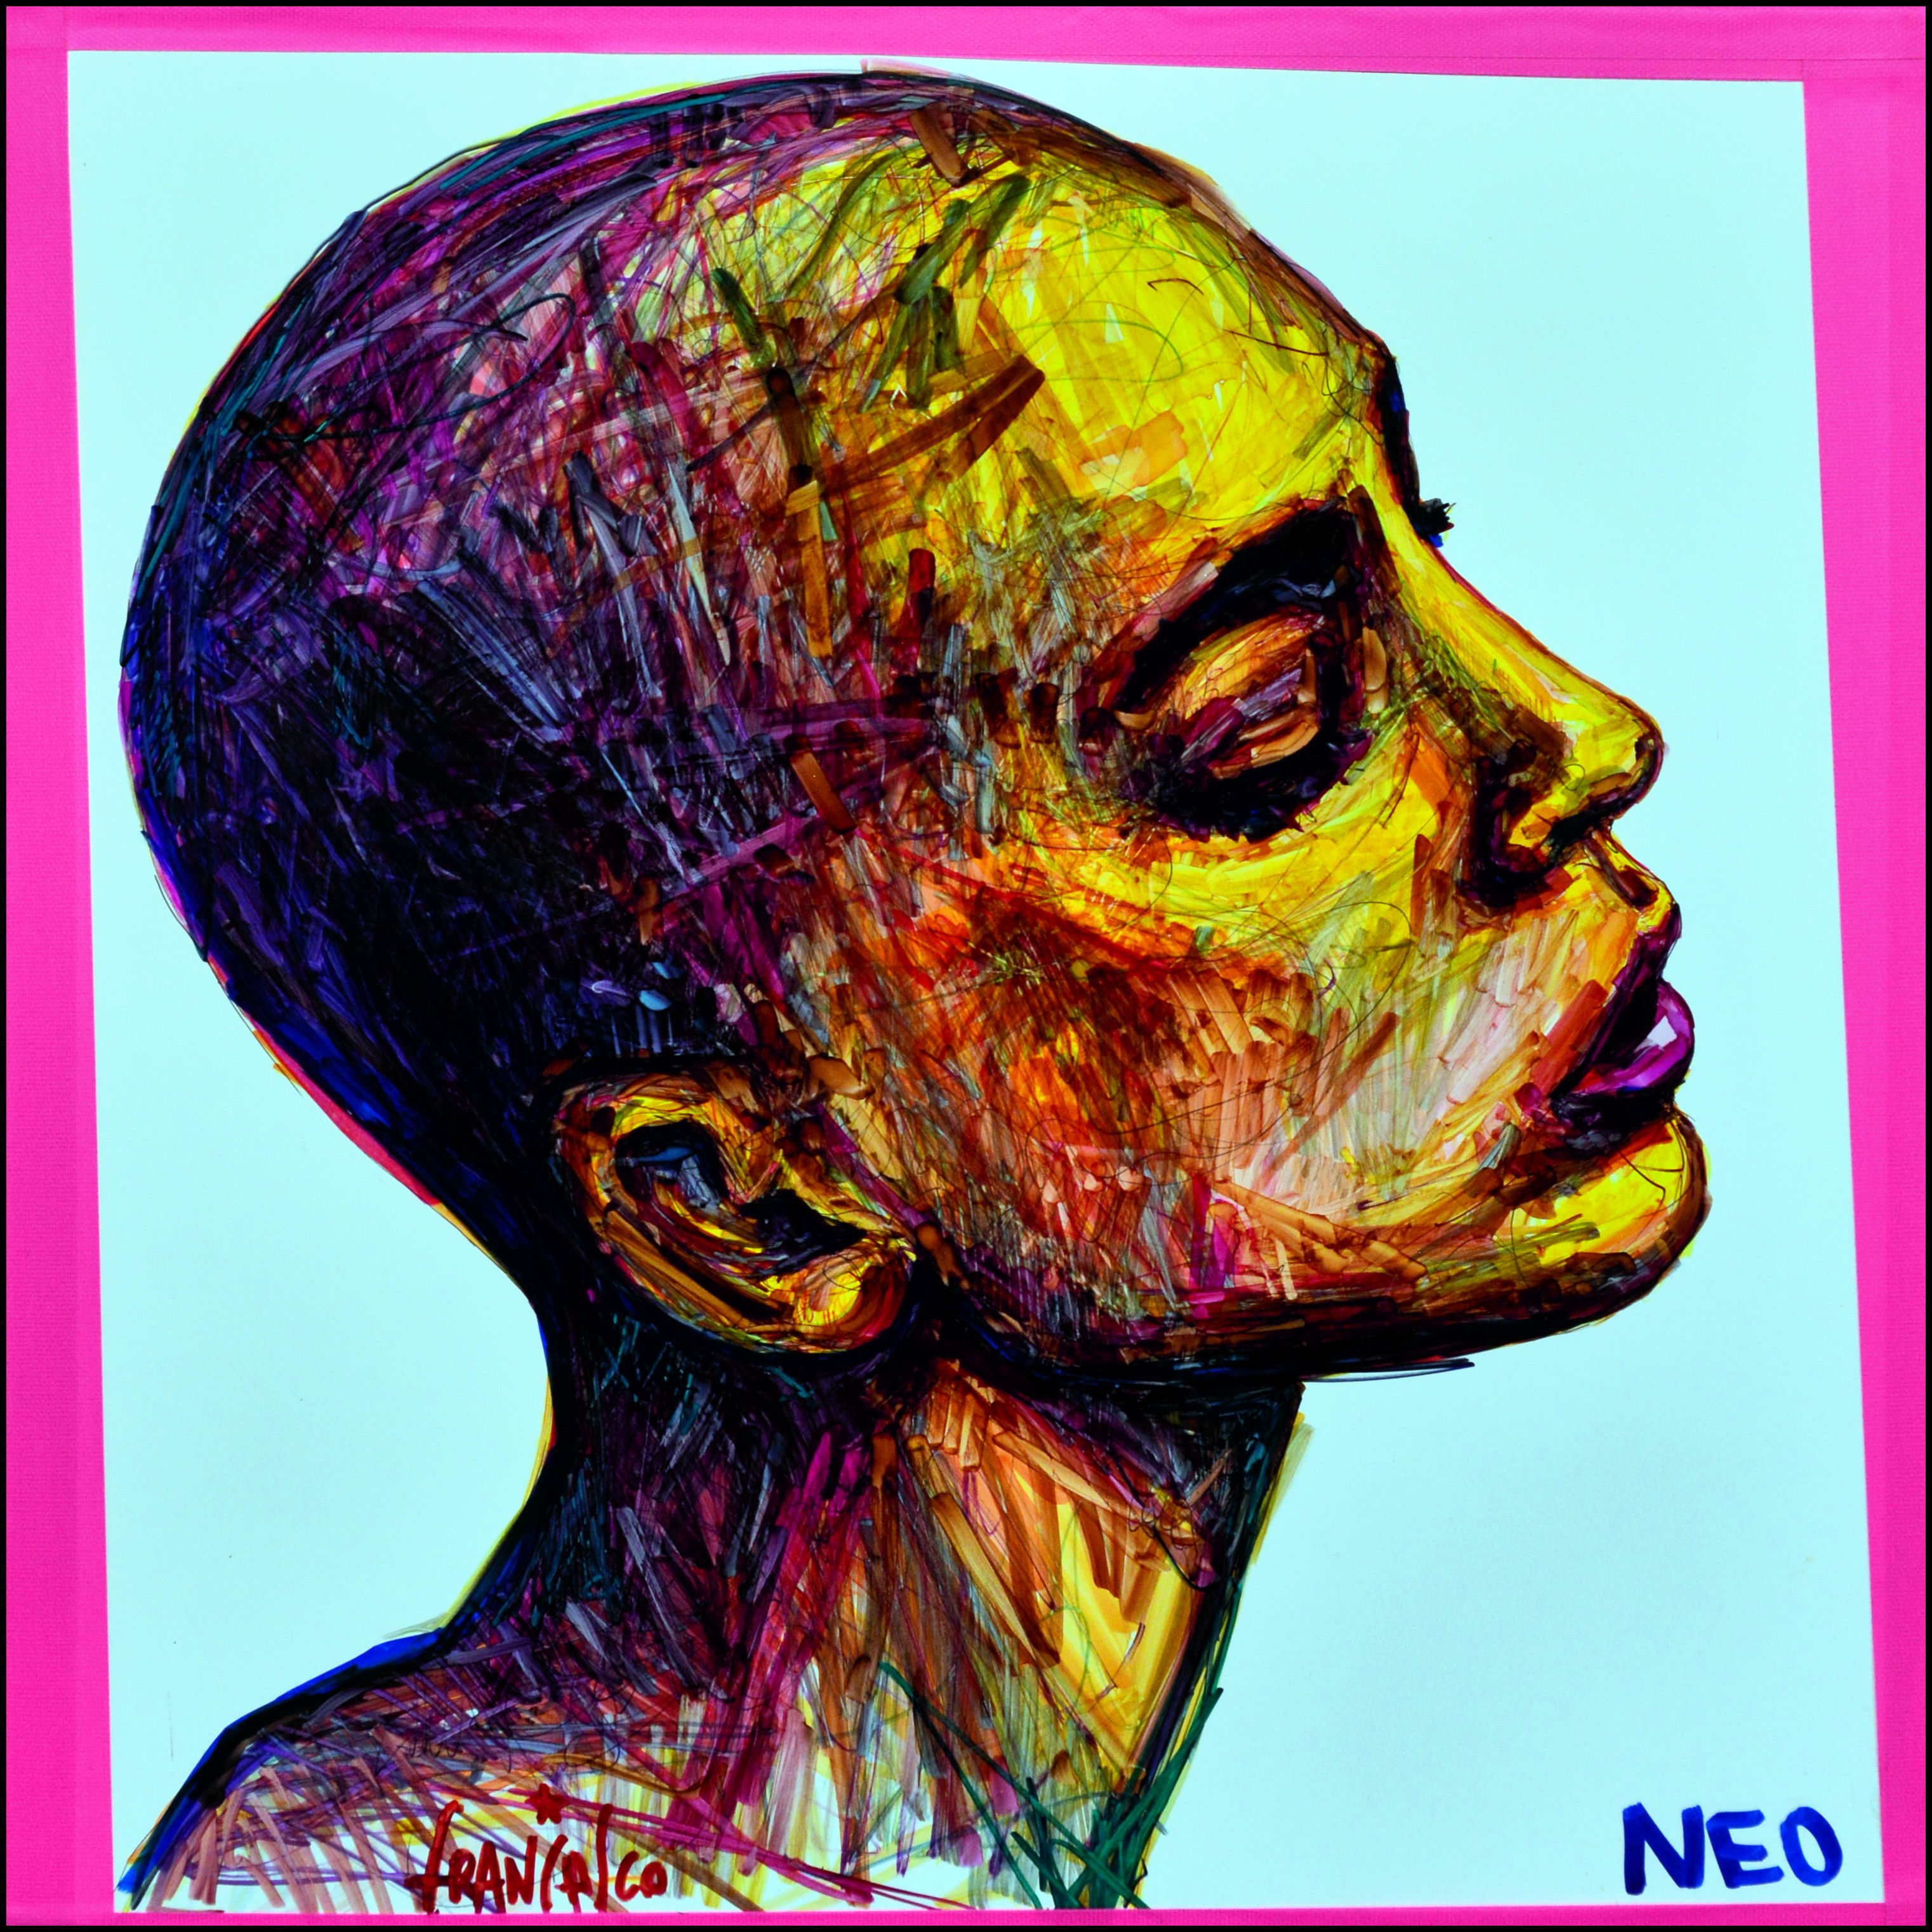 Francesco NEO_NIRVANA_Marker_55 x 55 cm_